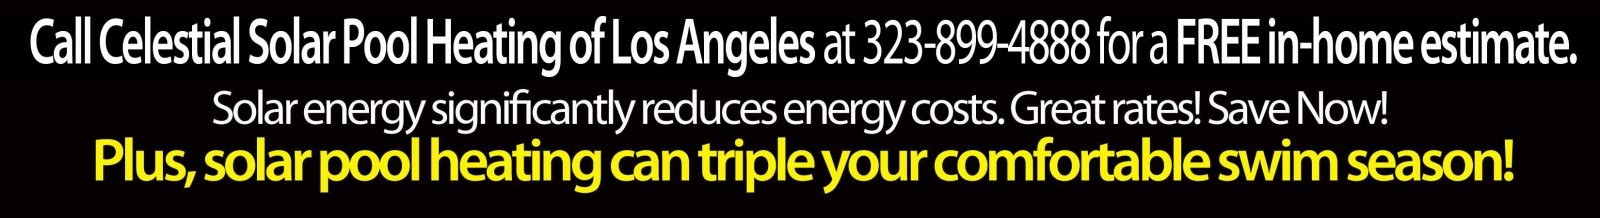 Celestial Solar Pool Heating Los Angeles